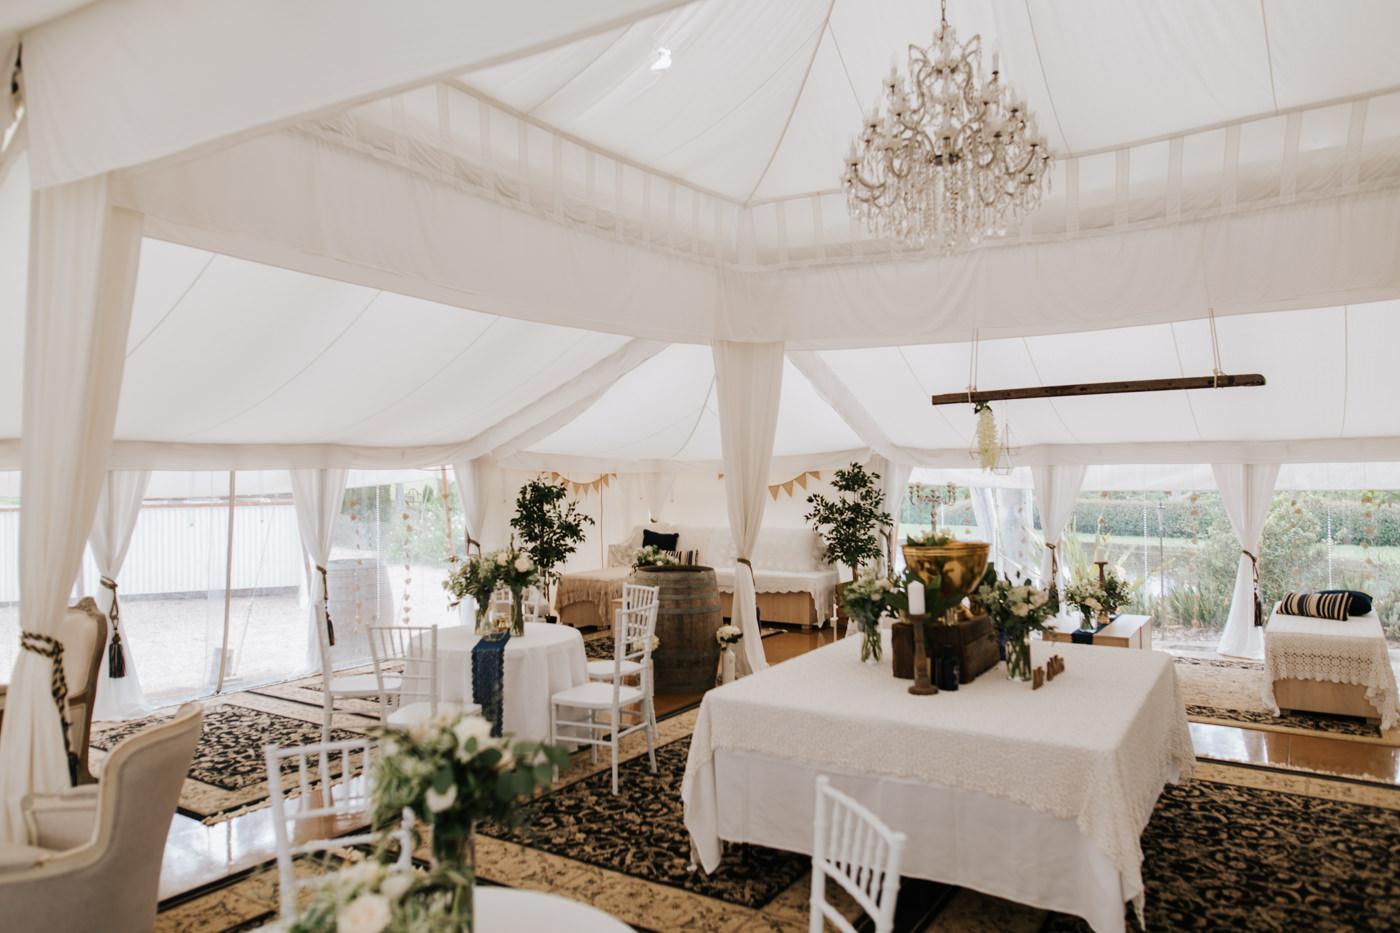 Nick & Vanezza - Fernbank Farm Wedding - Samantha Heather Photography-49.jpg